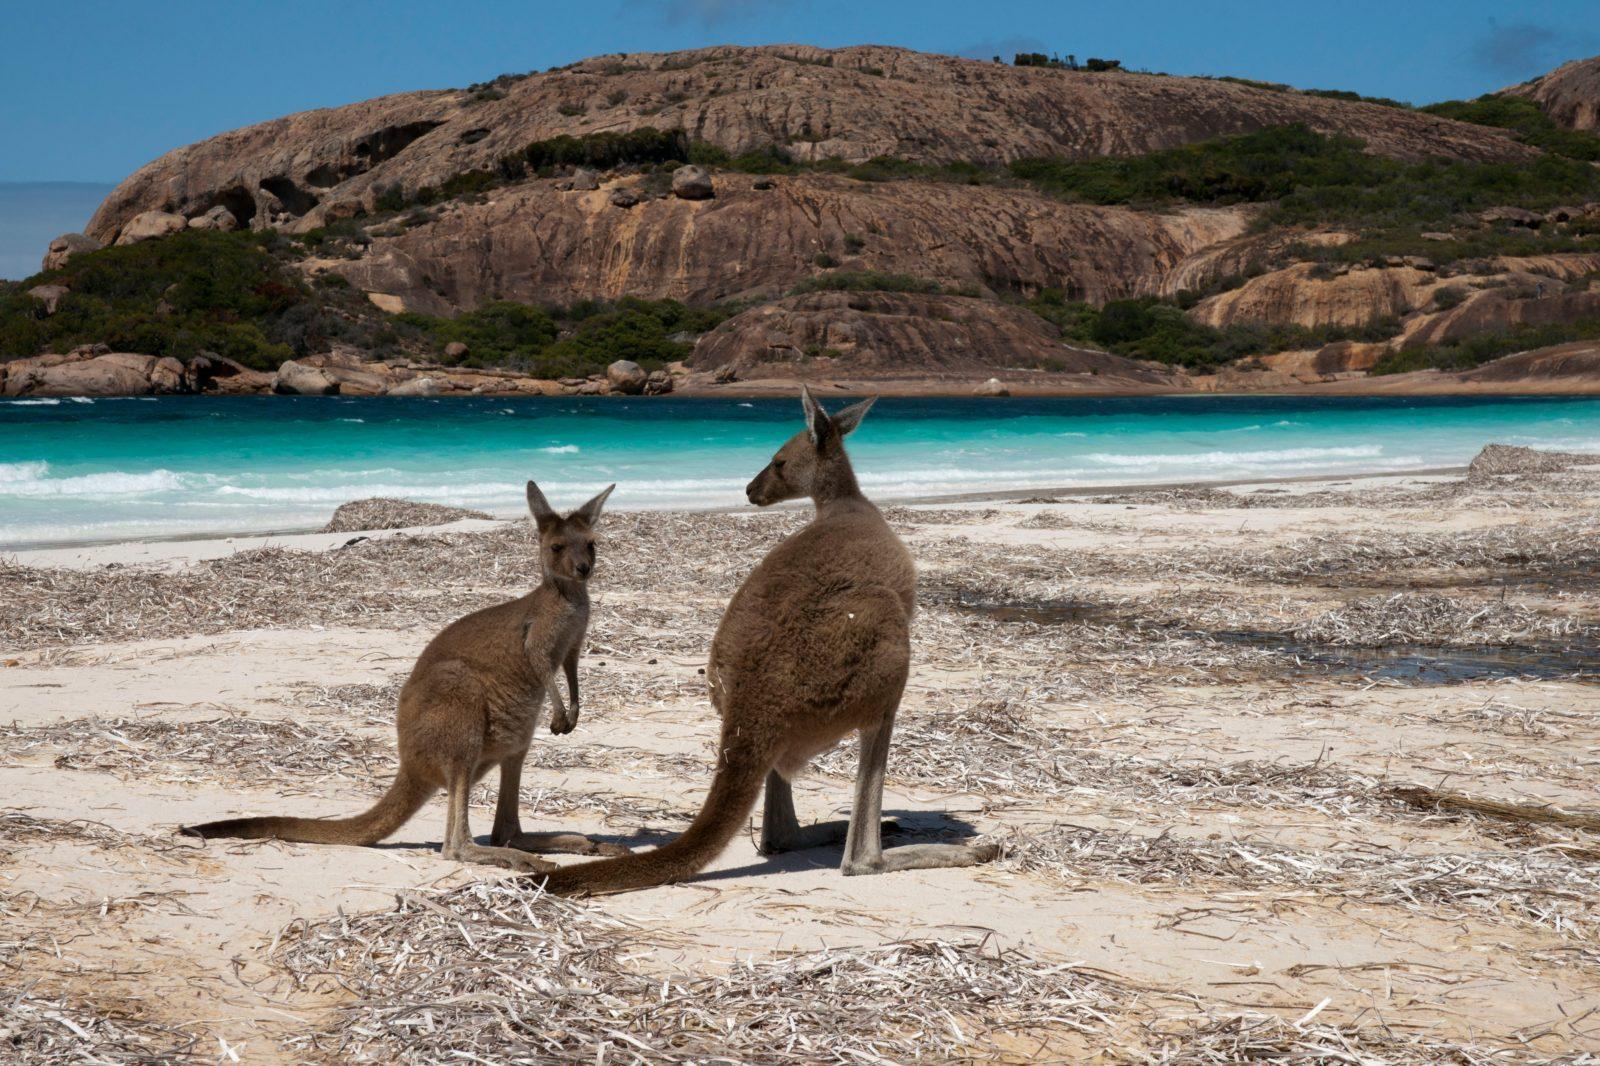 Cape Le Grand National Park, Esperance, Western Australia